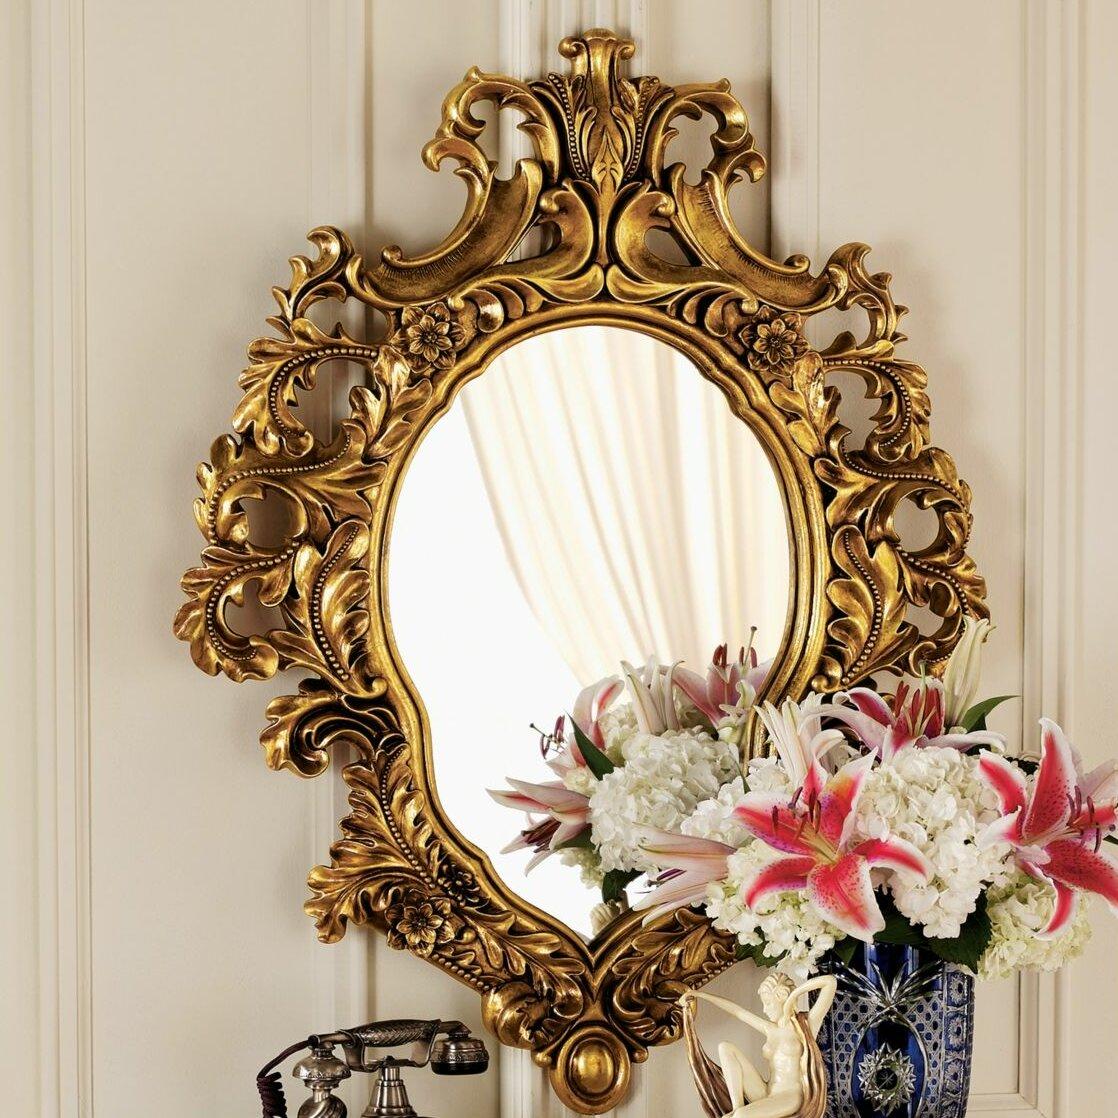 Design toscano madame antoinette salon mirror reviews for Design toscano